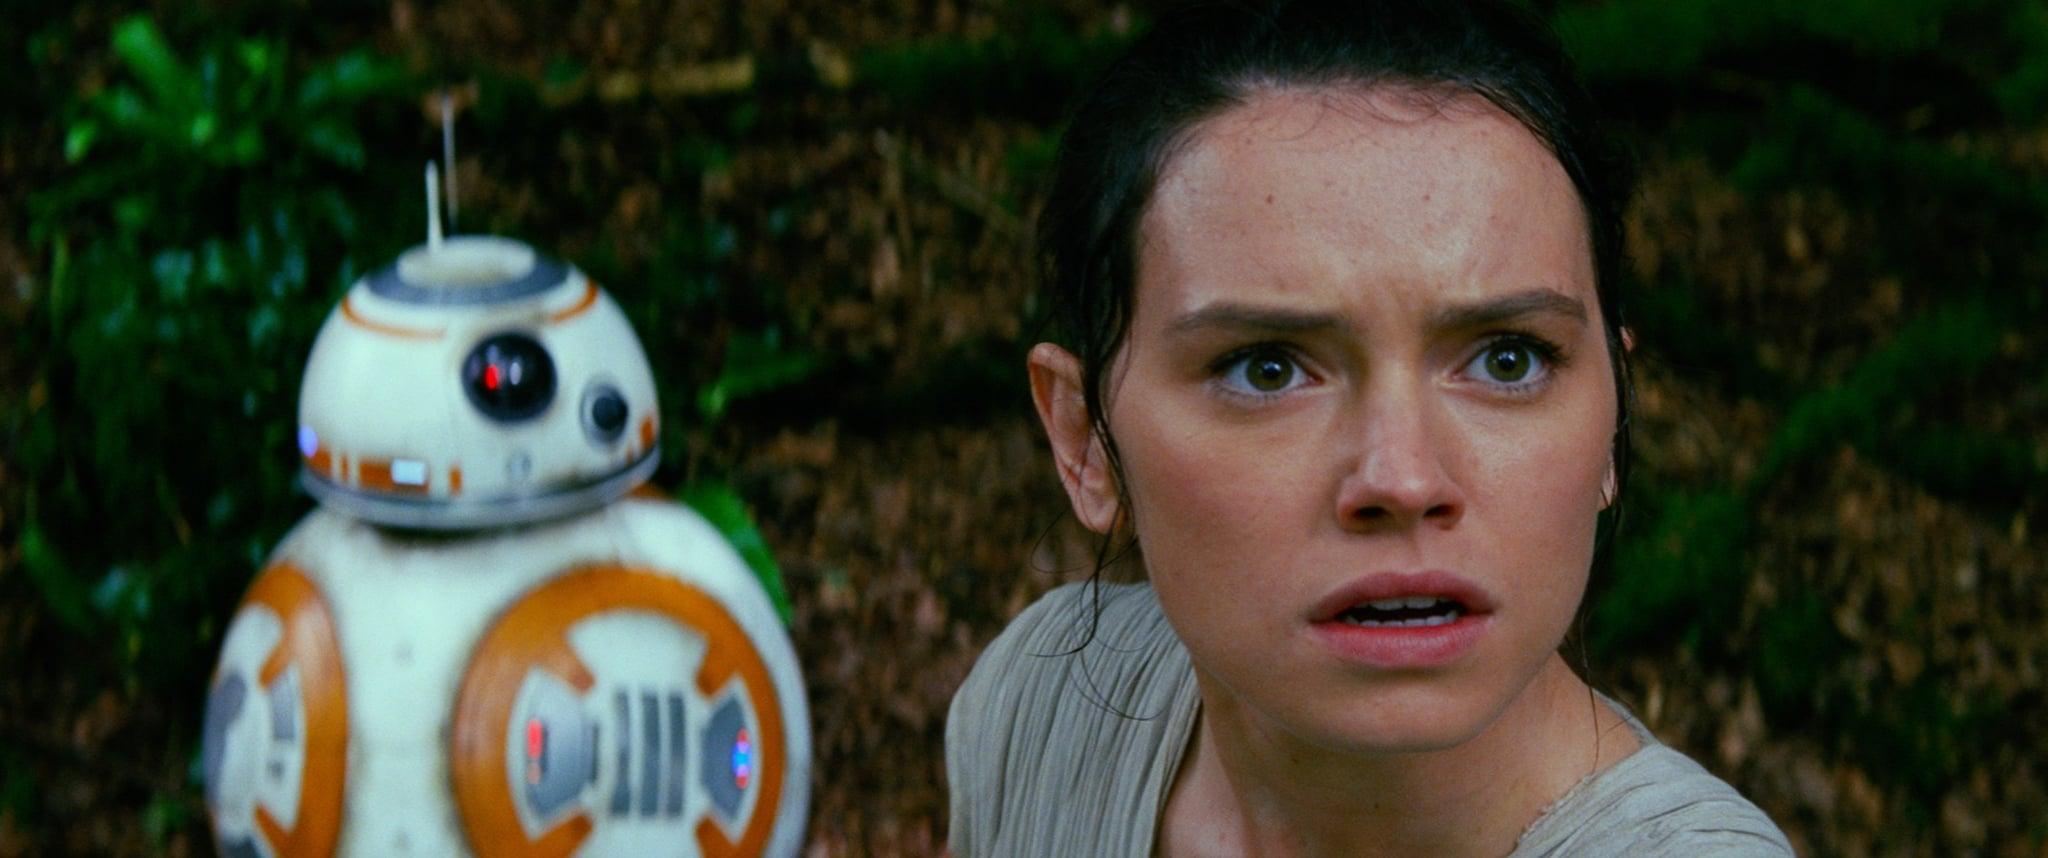 Rey Is a Palpatine Star Wars Theory   POPSUGAR Entertainment